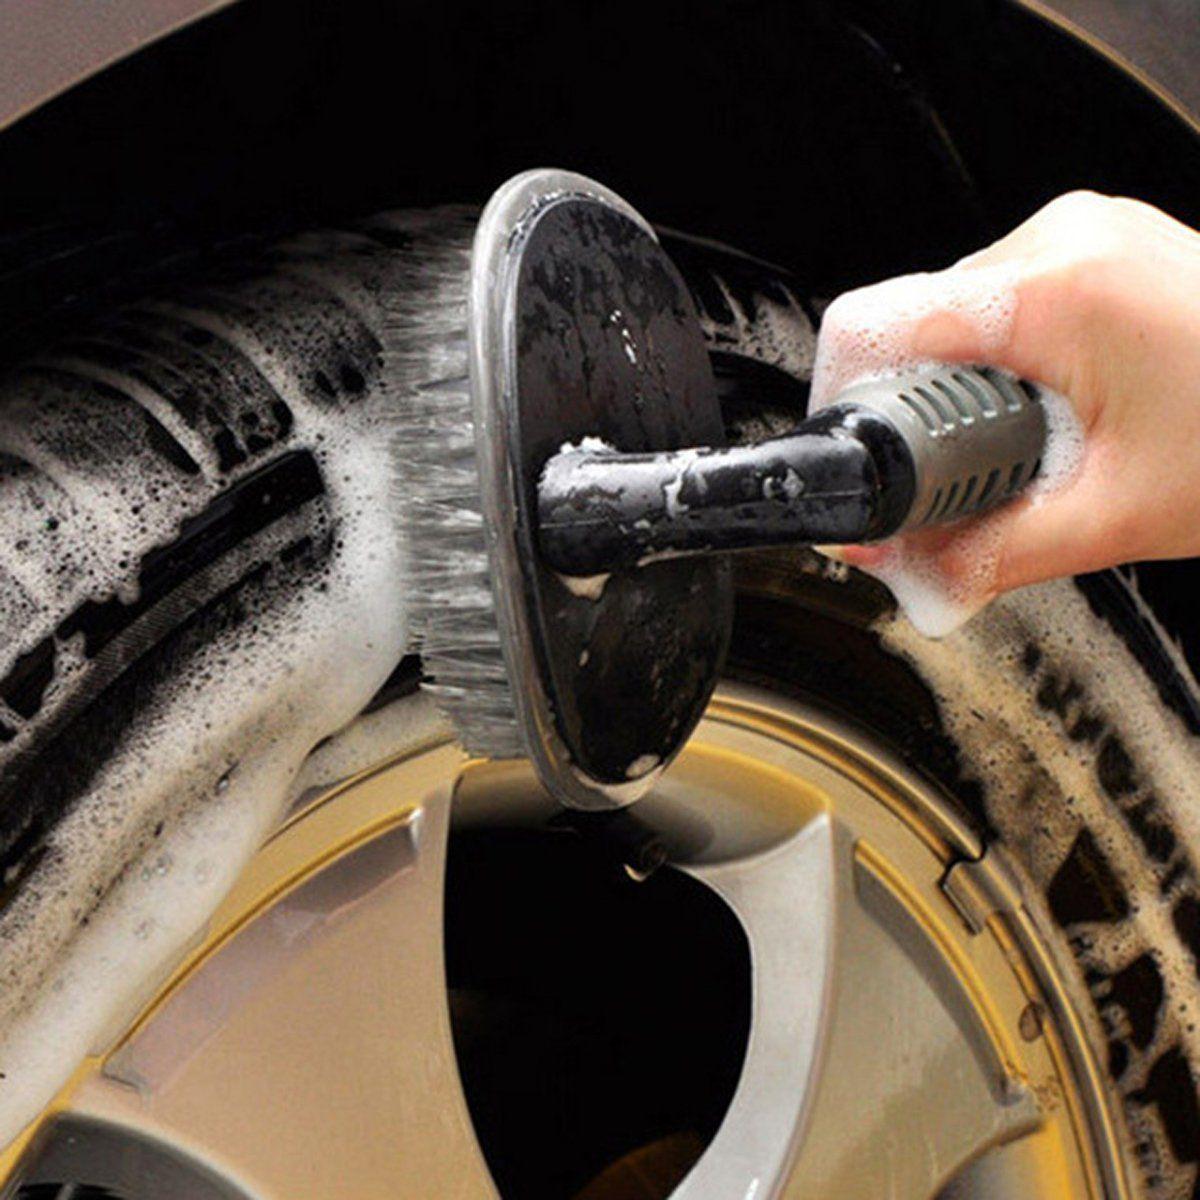 TakeCare Tire Rim Scrub Brush Hub Clean Wash Useful Brush Car Truck Motorcycle Bike Washing Cleaning Tool Accessories